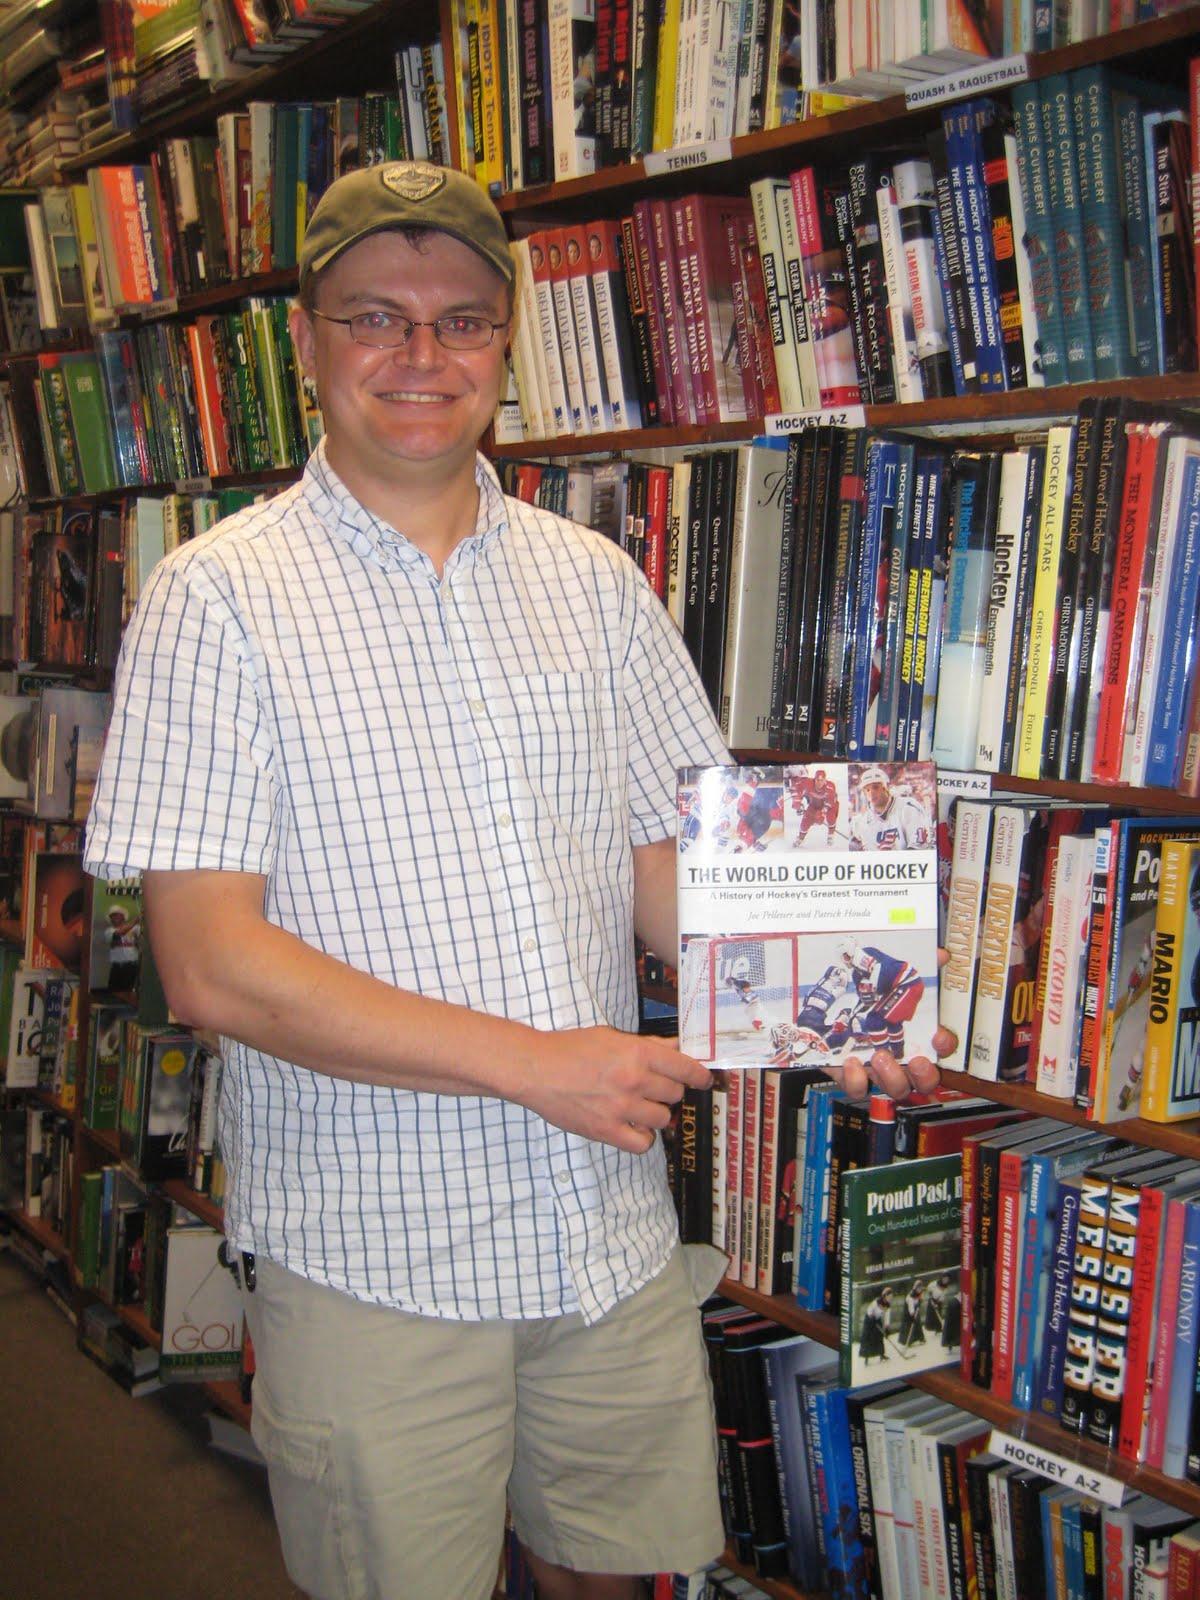 Greatest Hockey Legends com: Used Bookstore Treasures